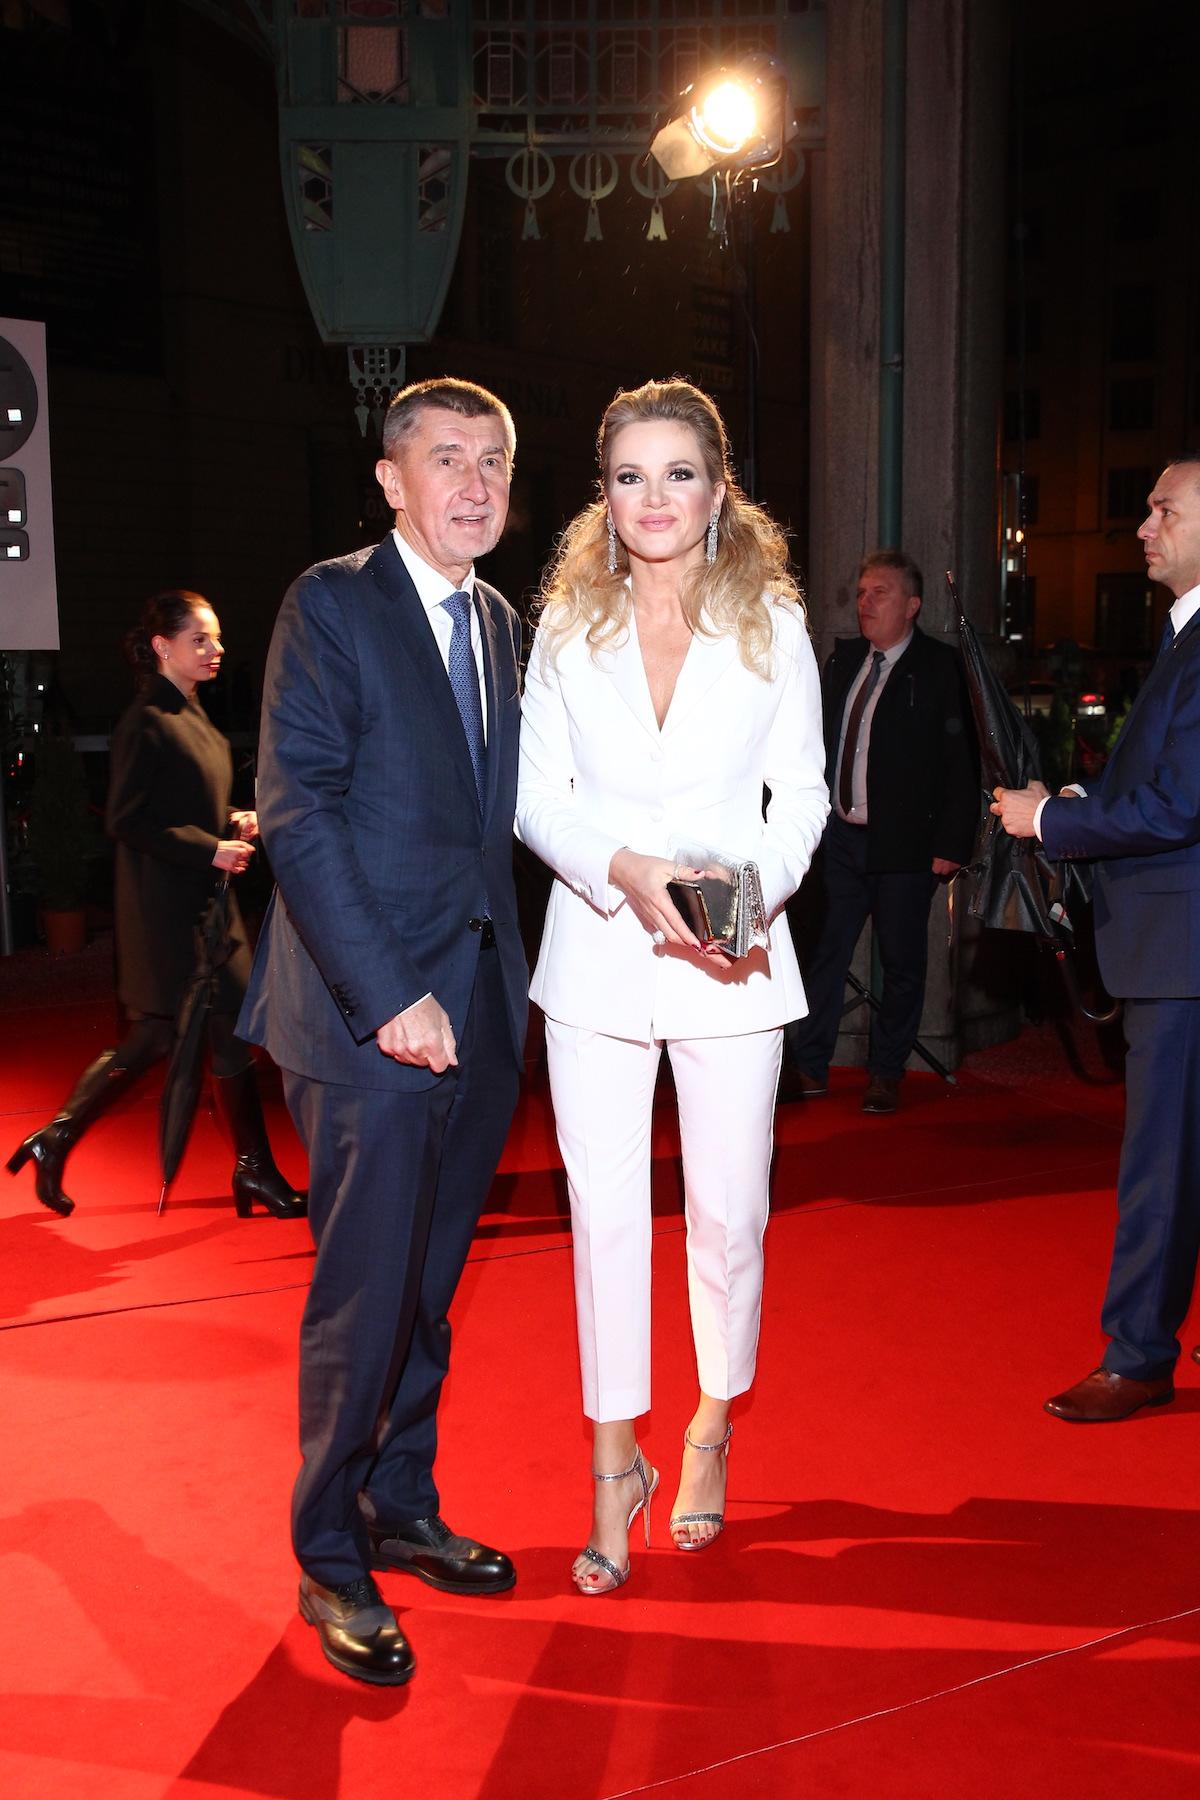 Premiér Andrej Babiš s chotí Monikou